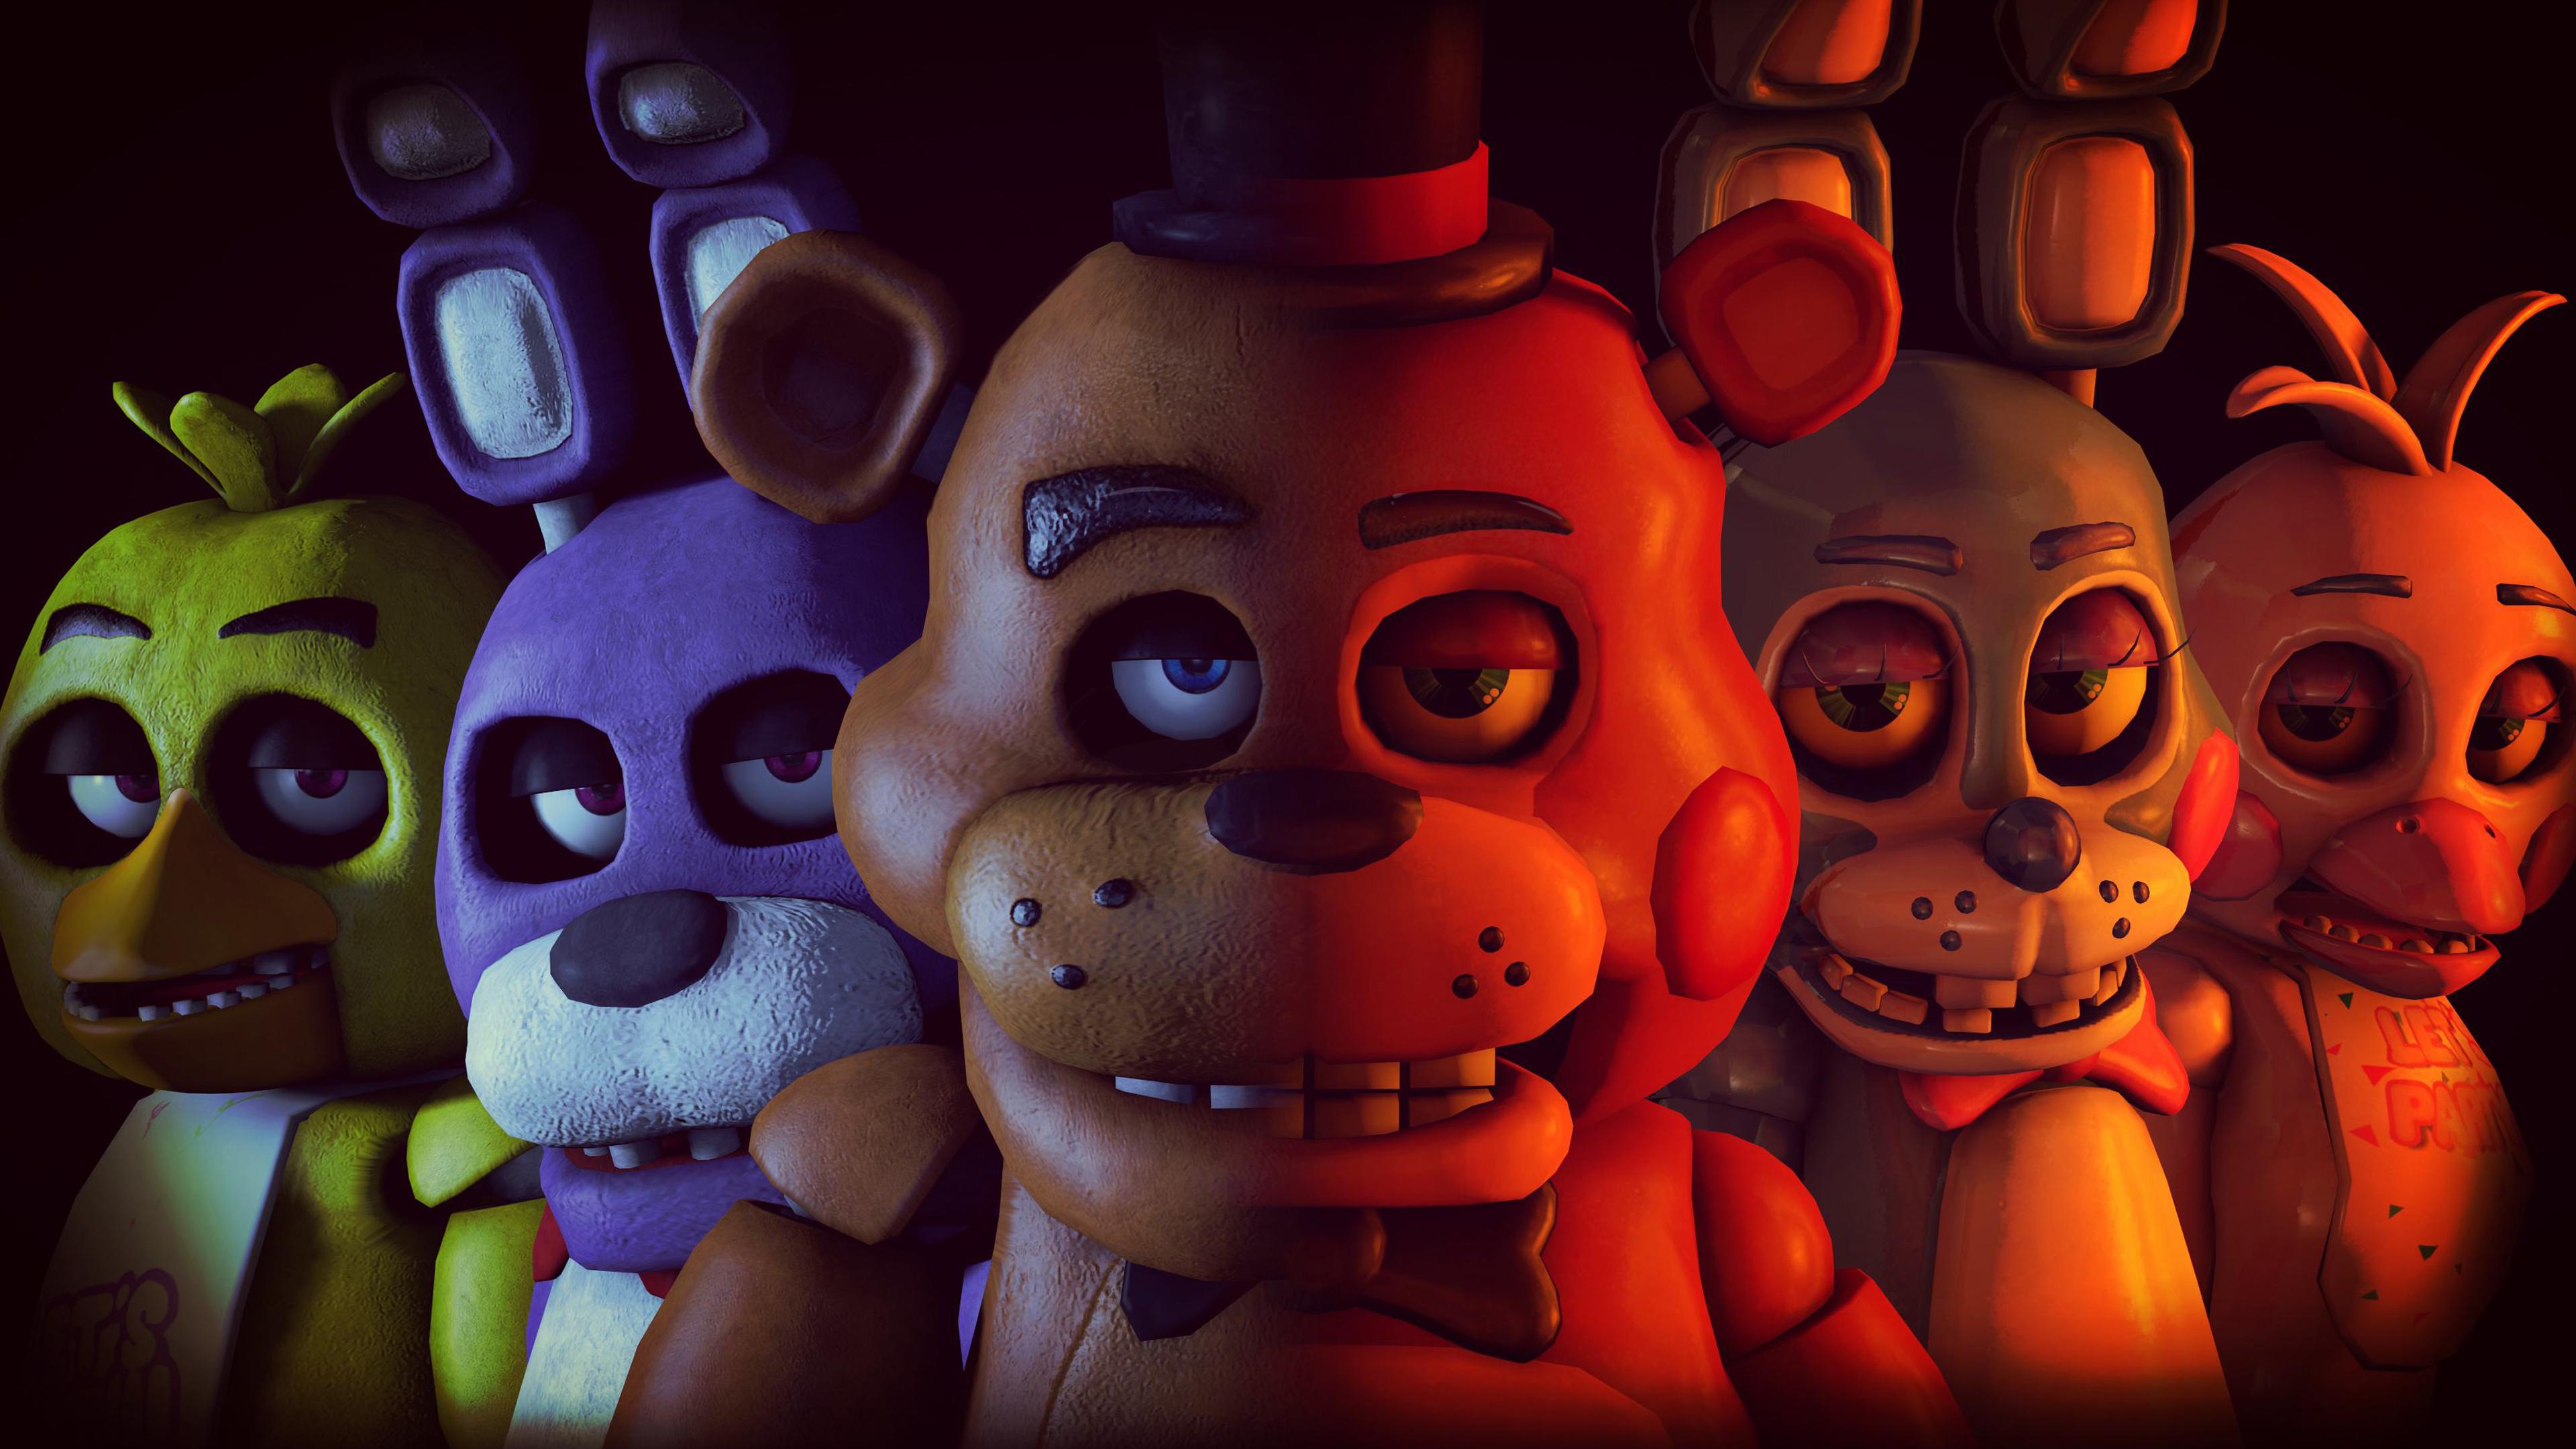 Five Nights At Freddys 2 4k Ultra Hd Wallpaper Fnaf Vr